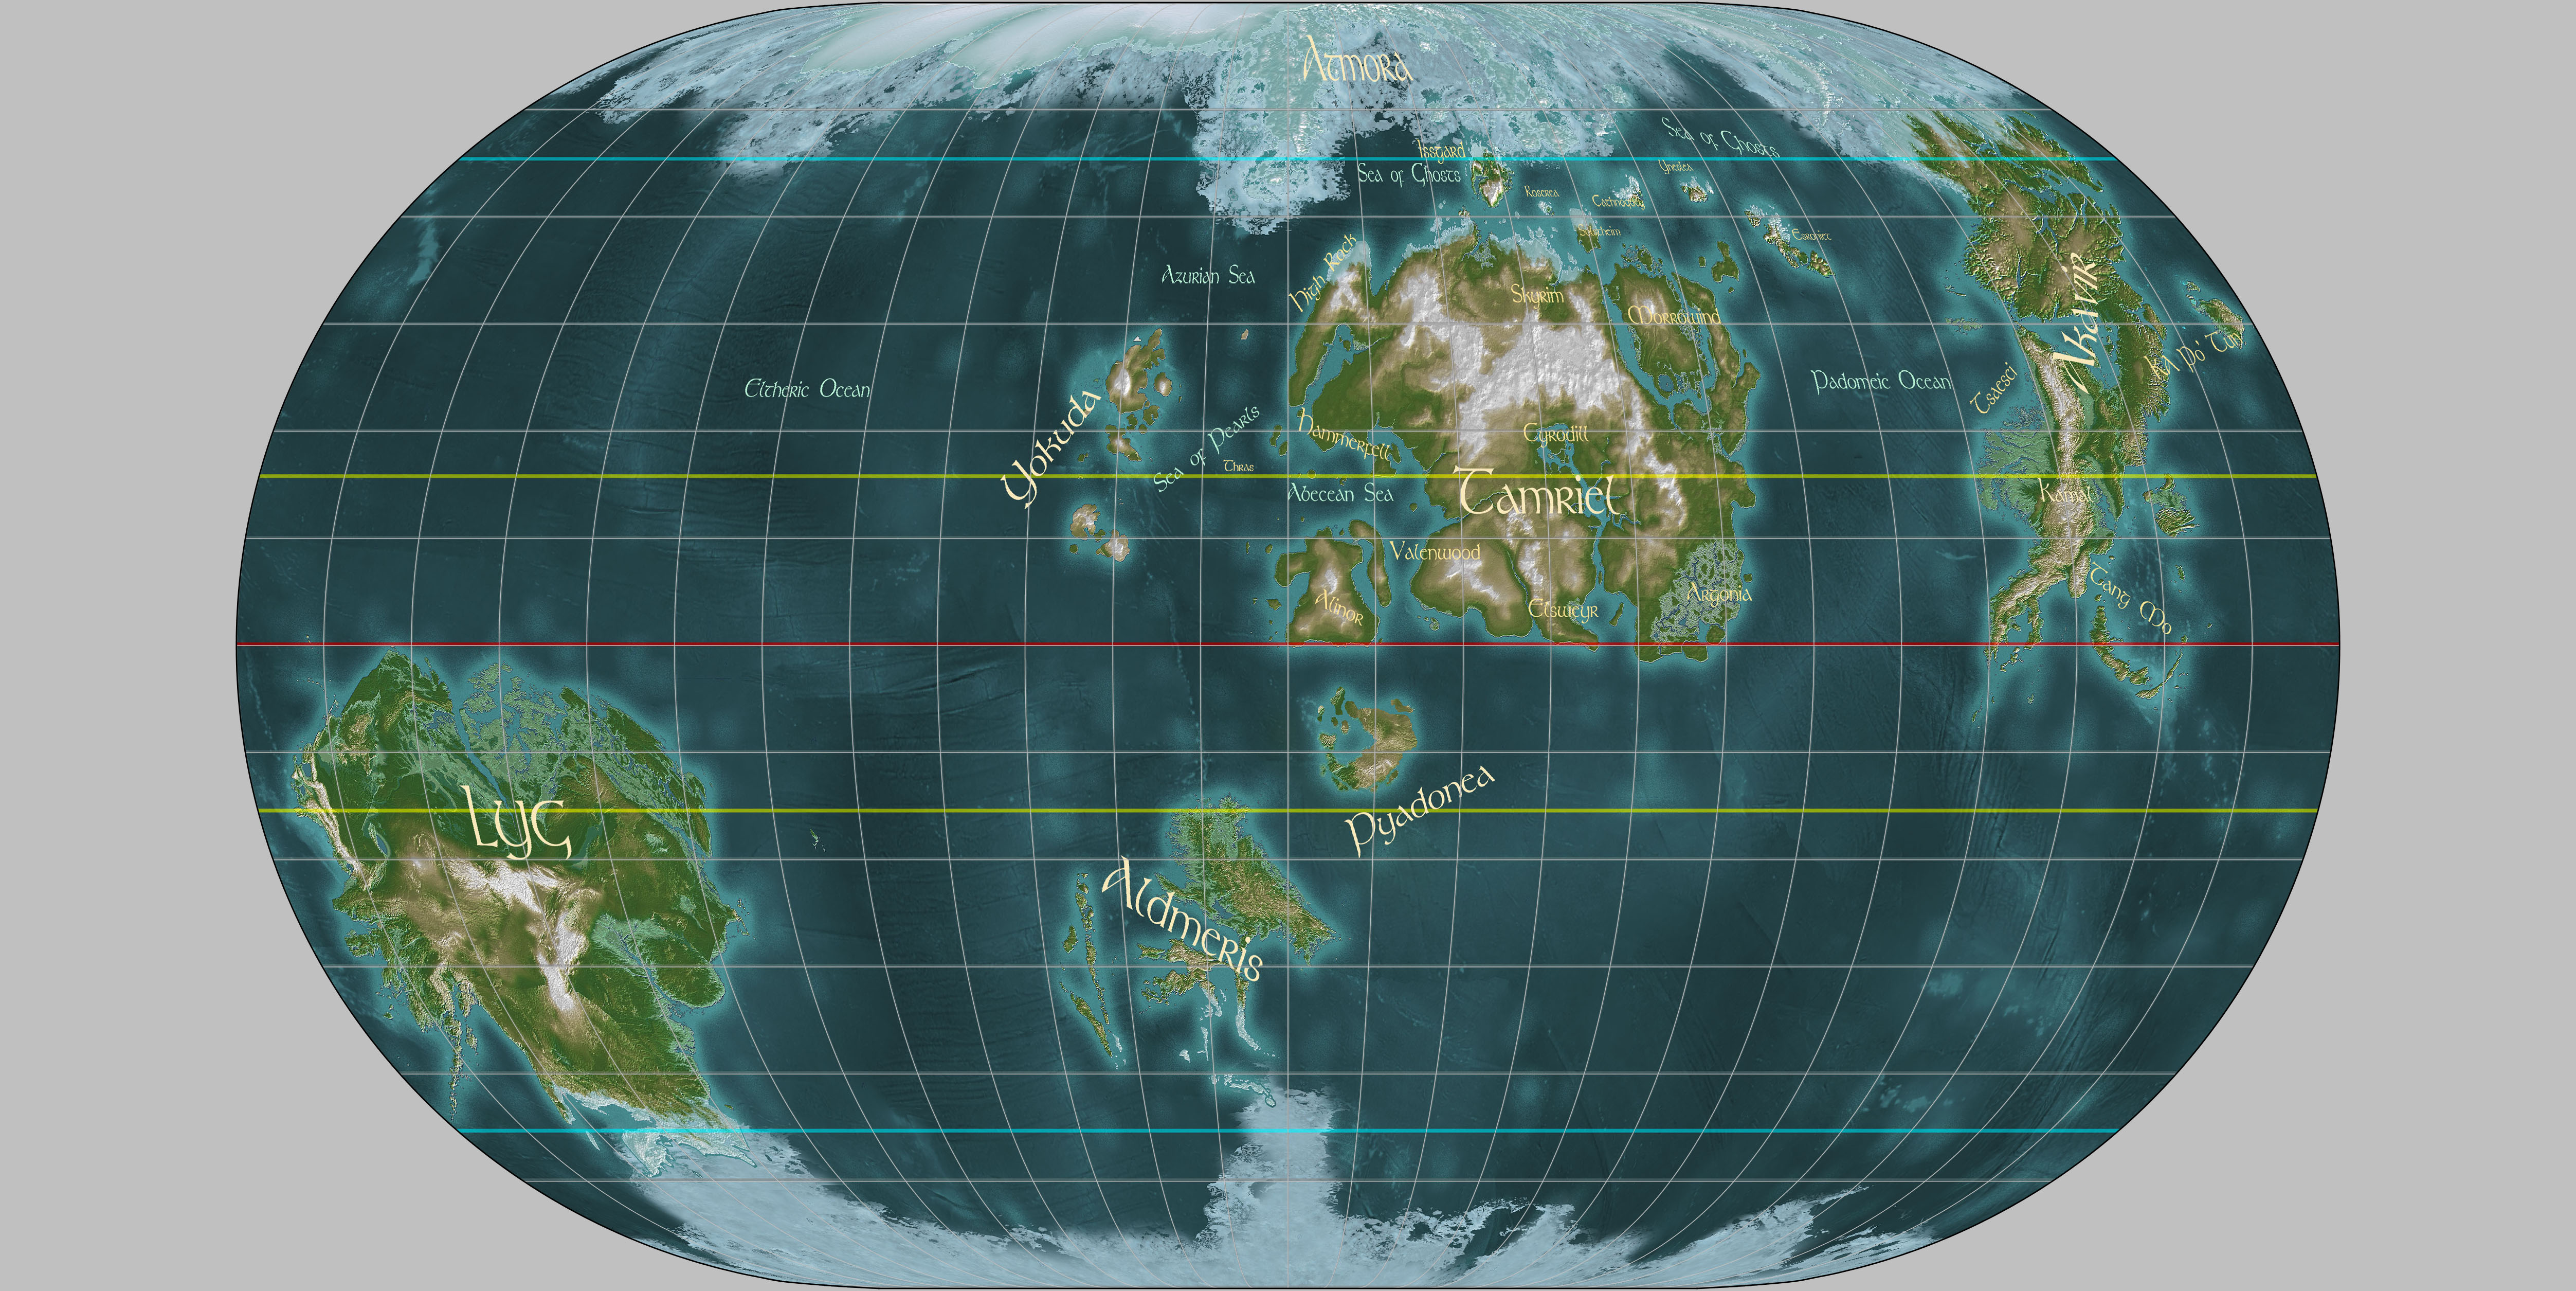 The Elder Scrolls World Map Of Nirn Imaginarymaps